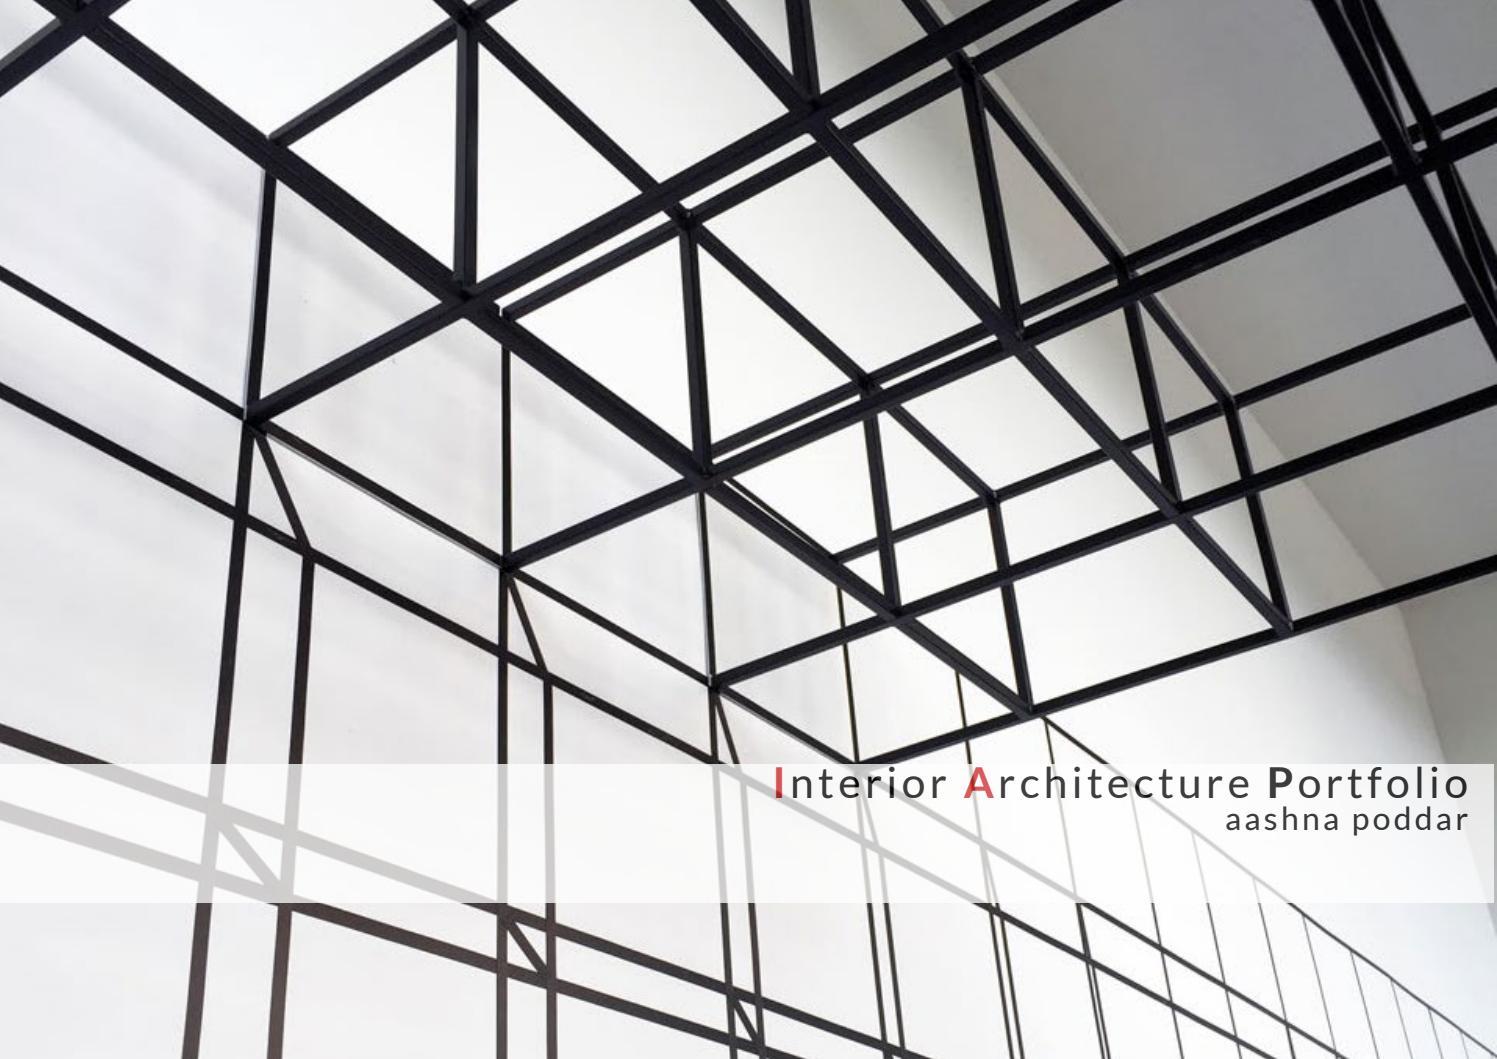 how to mix textures interior design photoshop